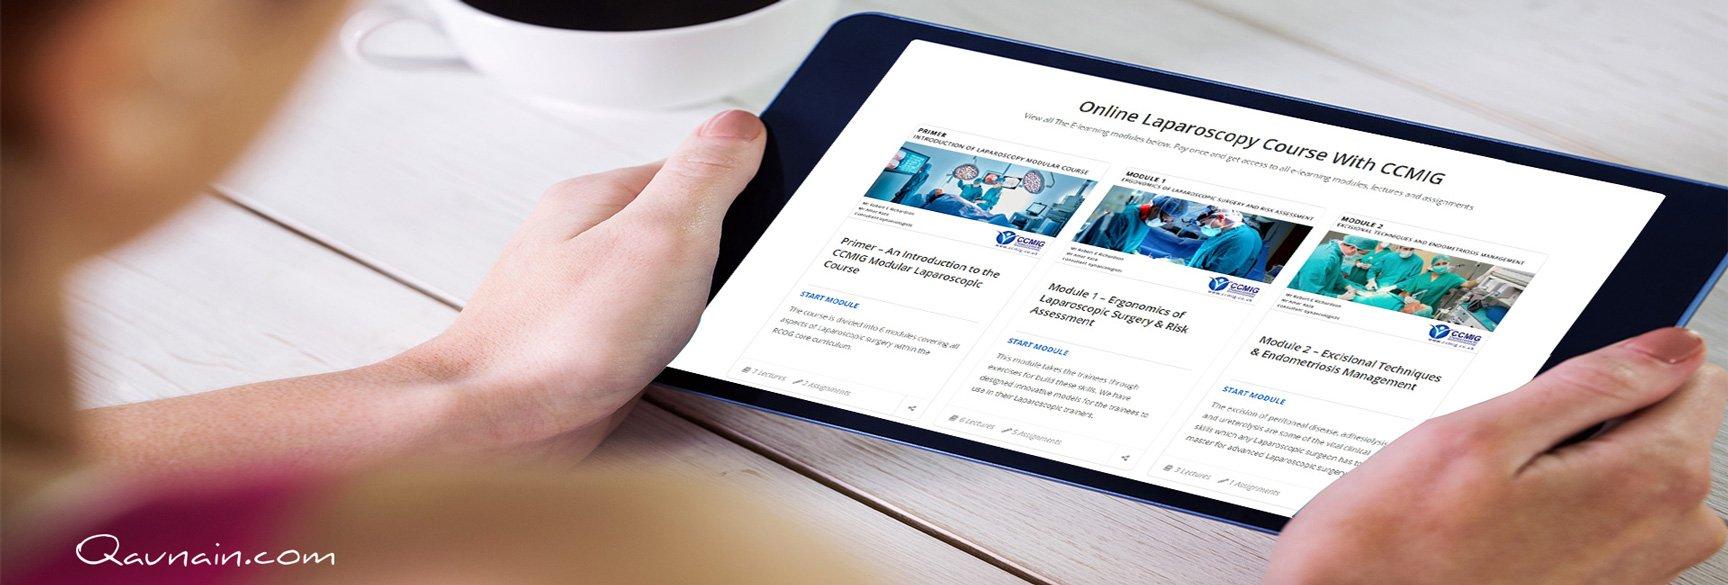 Cloud Software / Web App Creation